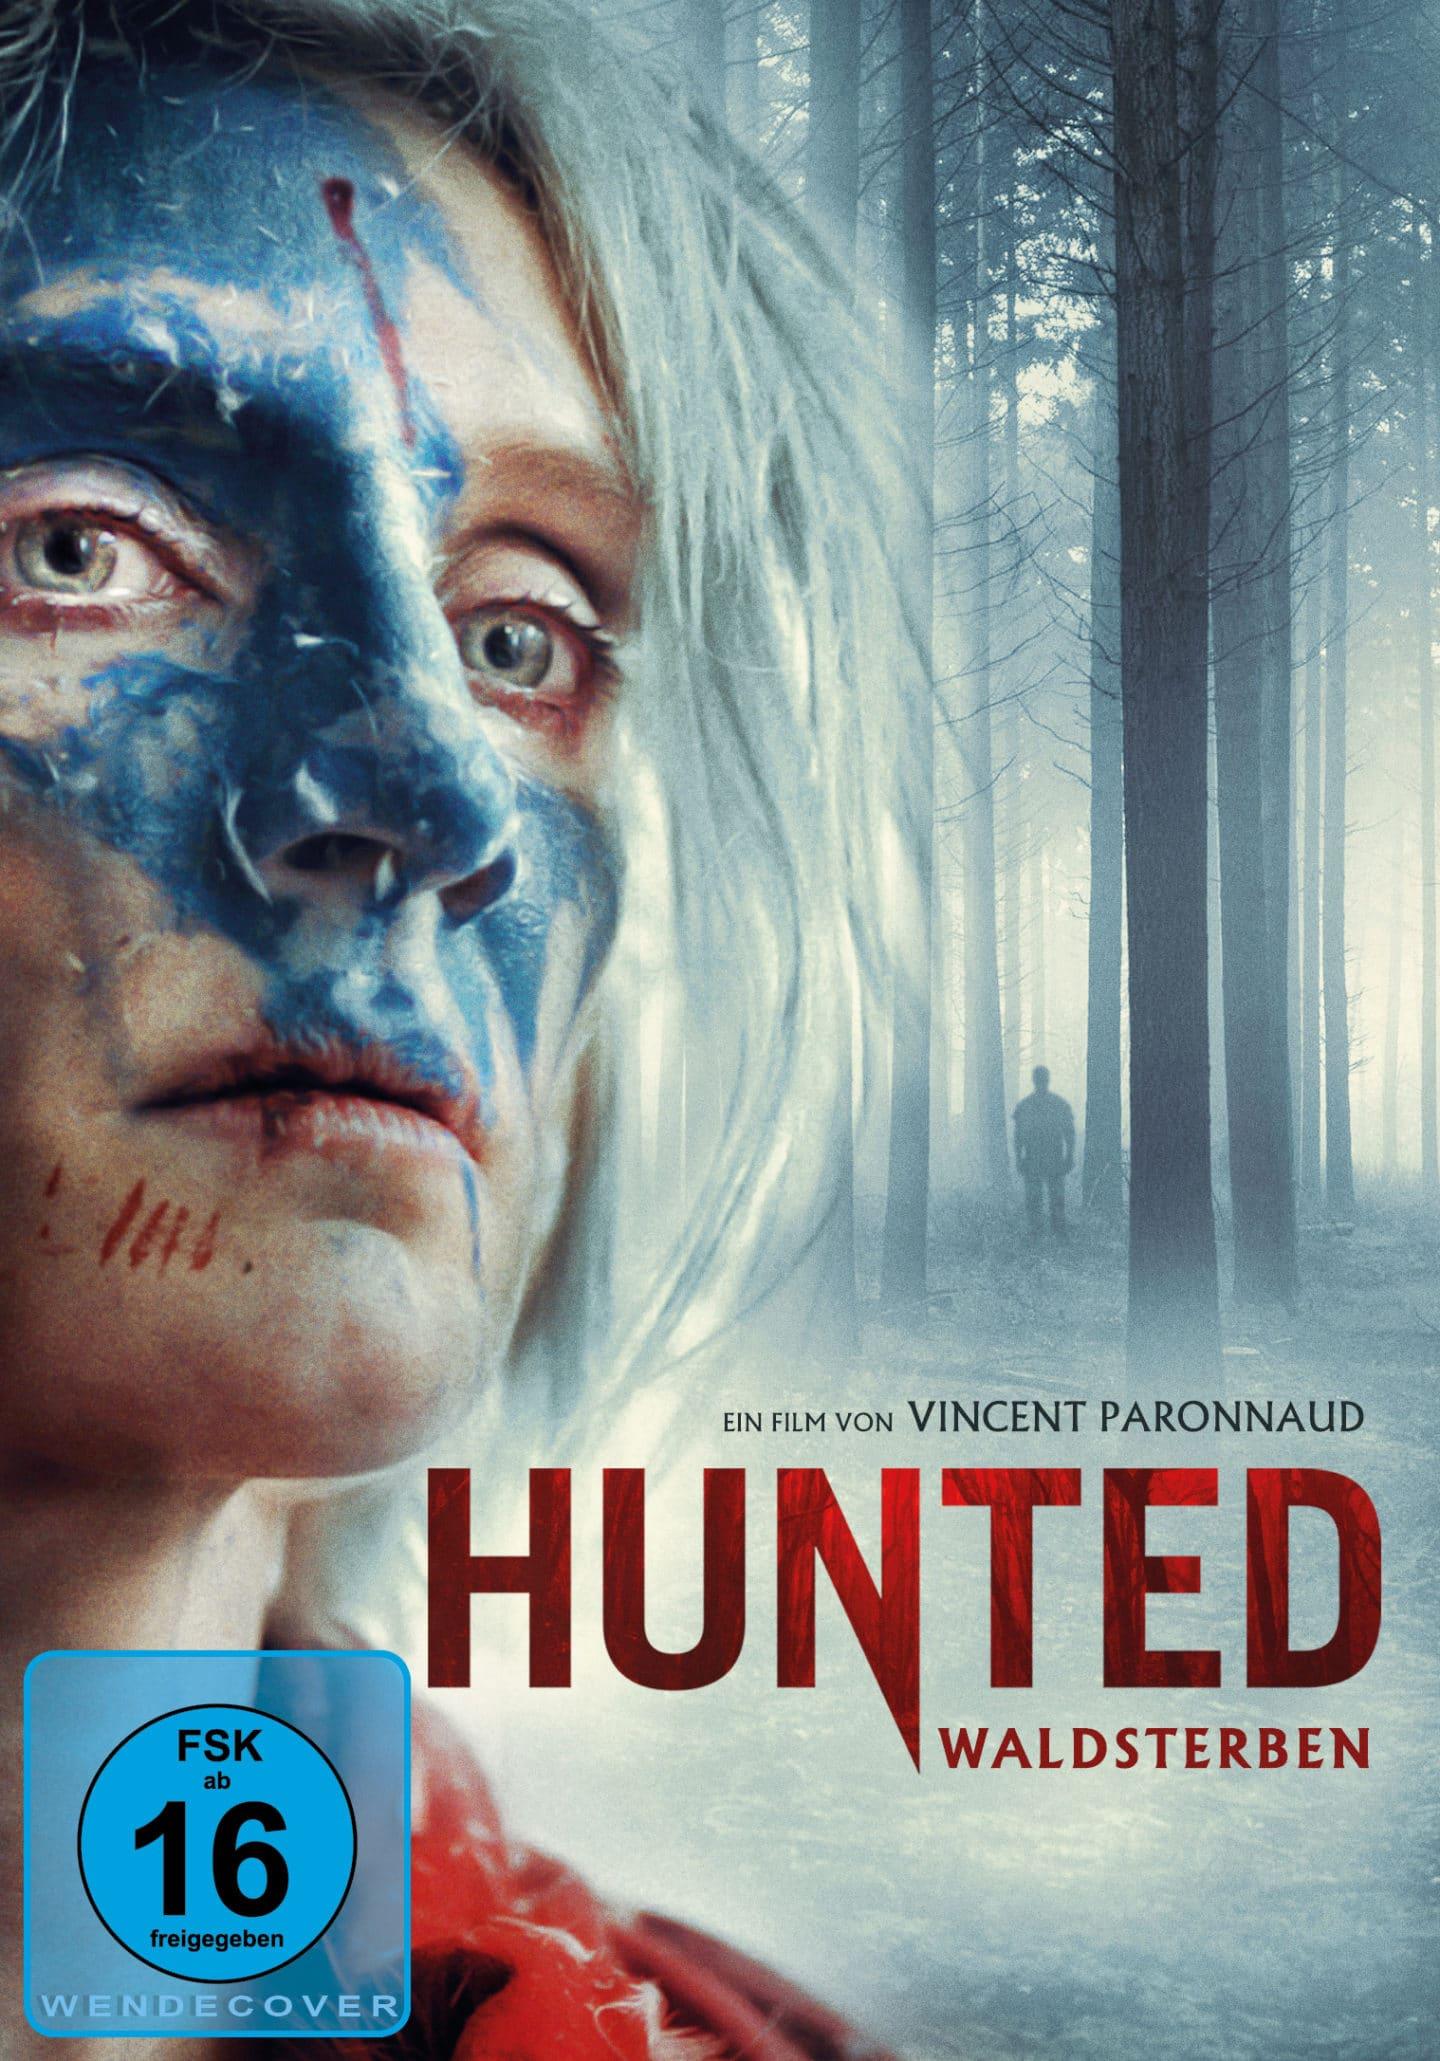 Hunted – Waldsterben – DVD Cover